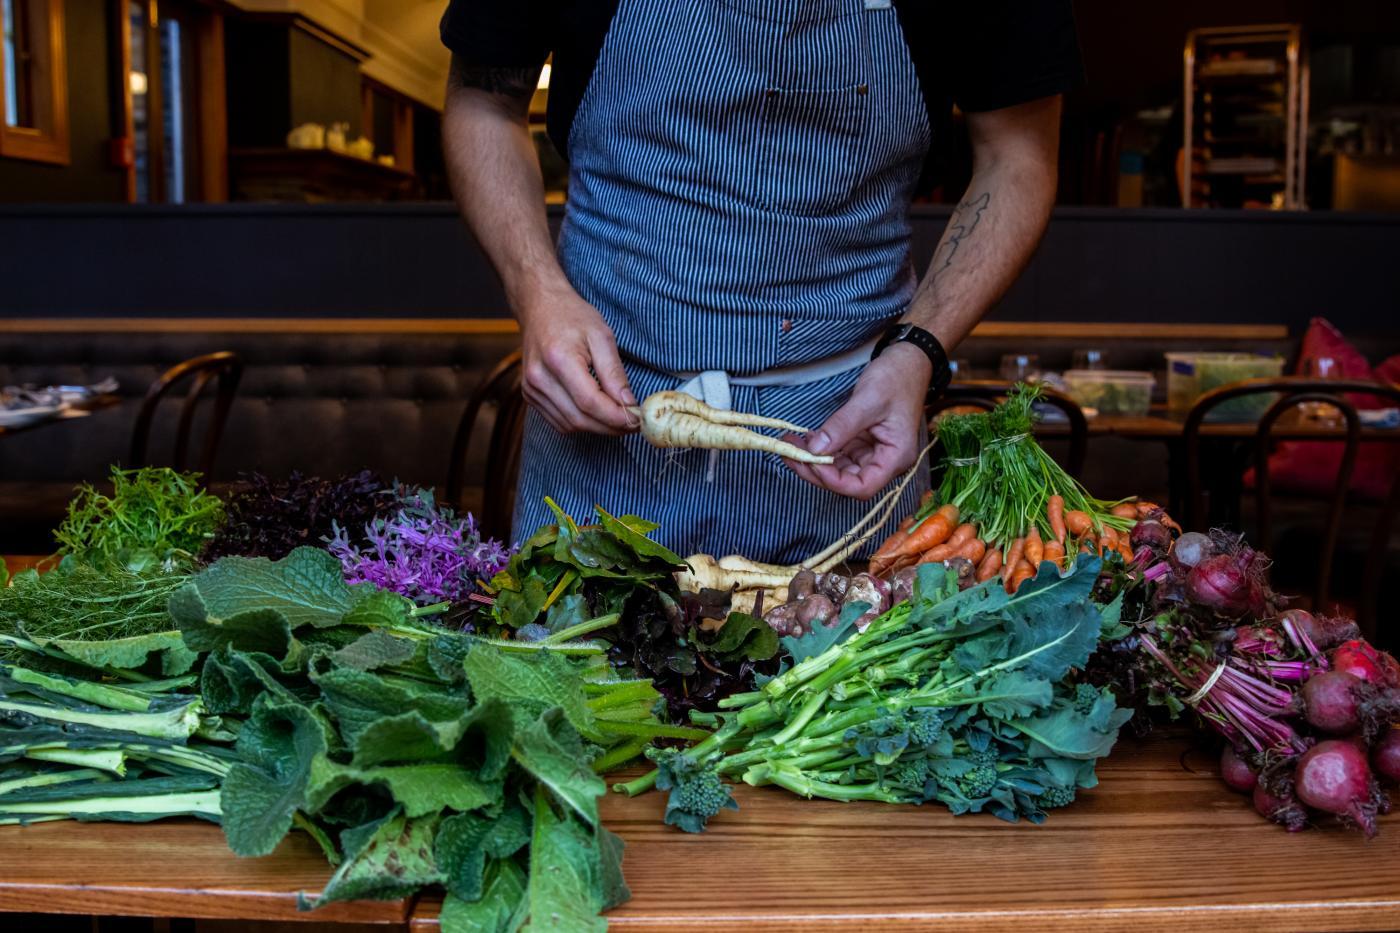 Aosta winter menu and fresh produce